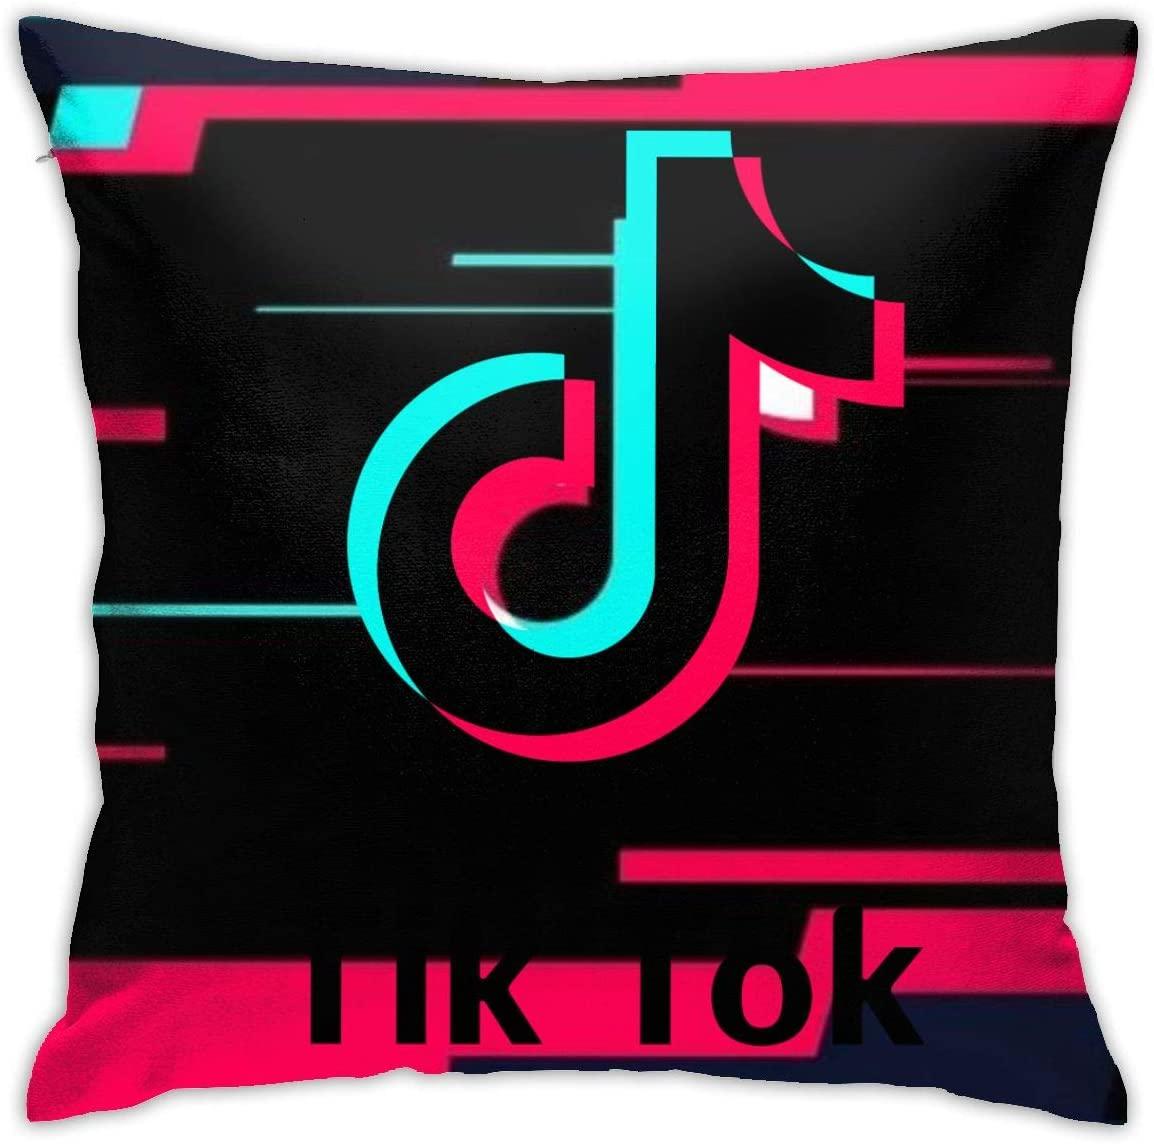 Shannahatten Pillow Covers TIK-Tok Home Decor Pillowcase Square Size 18inch18inch Cushion Case,Throw Pillow